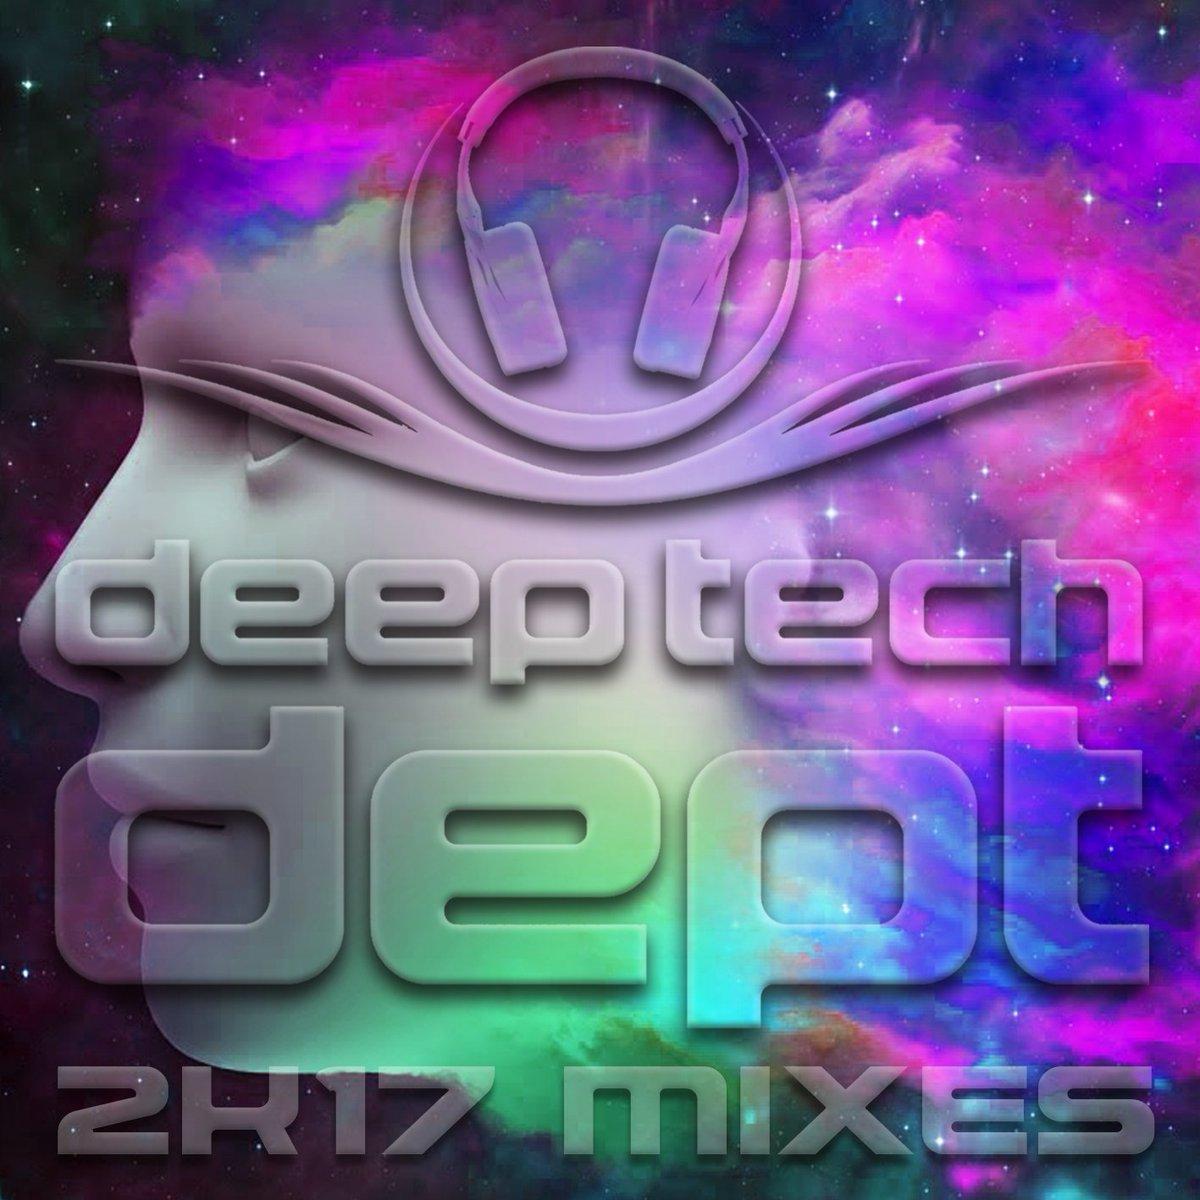 DTD &#39;UNIVERSAL LOVE&#39; #progressivehouse session 1  http:// mixcloud.com/deeptechdept  &nbsp;  <br>http://pic.twitter.com/oTmEstmDml